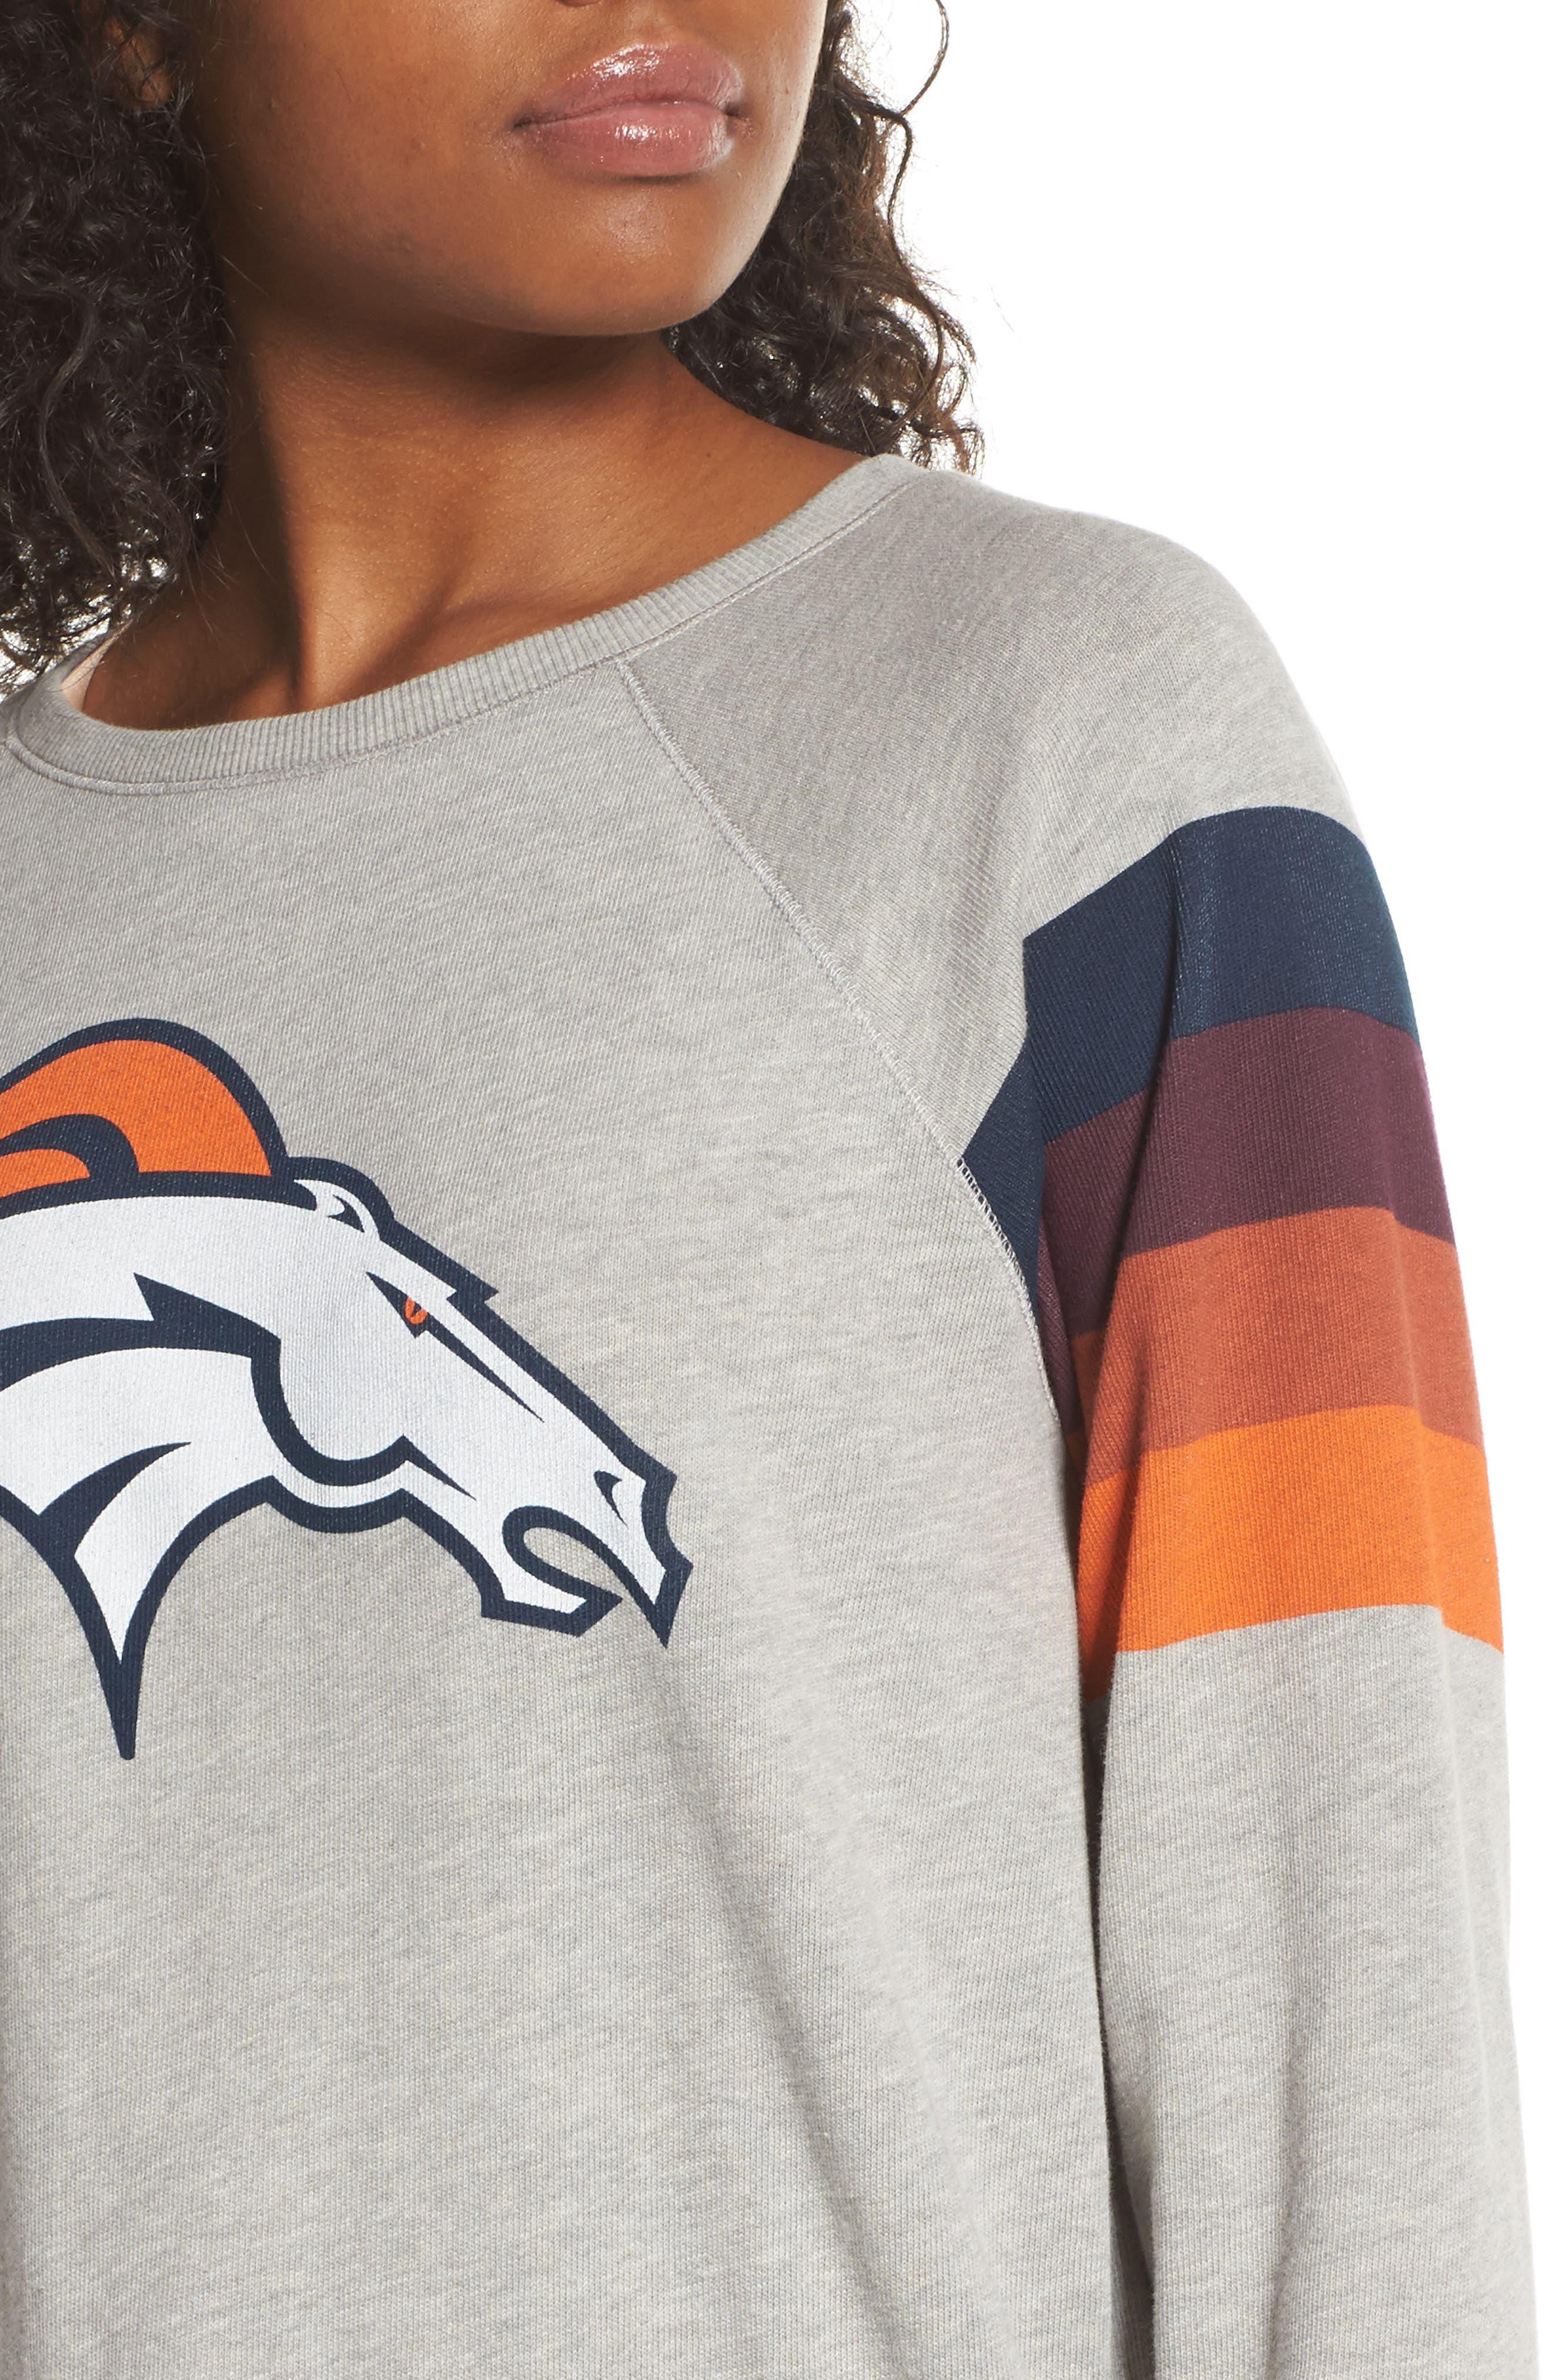 NFL Denver Broncos Hacci Sweatshirt,                             Alternate thumbnail 4, color,                             Dove Heather Grey